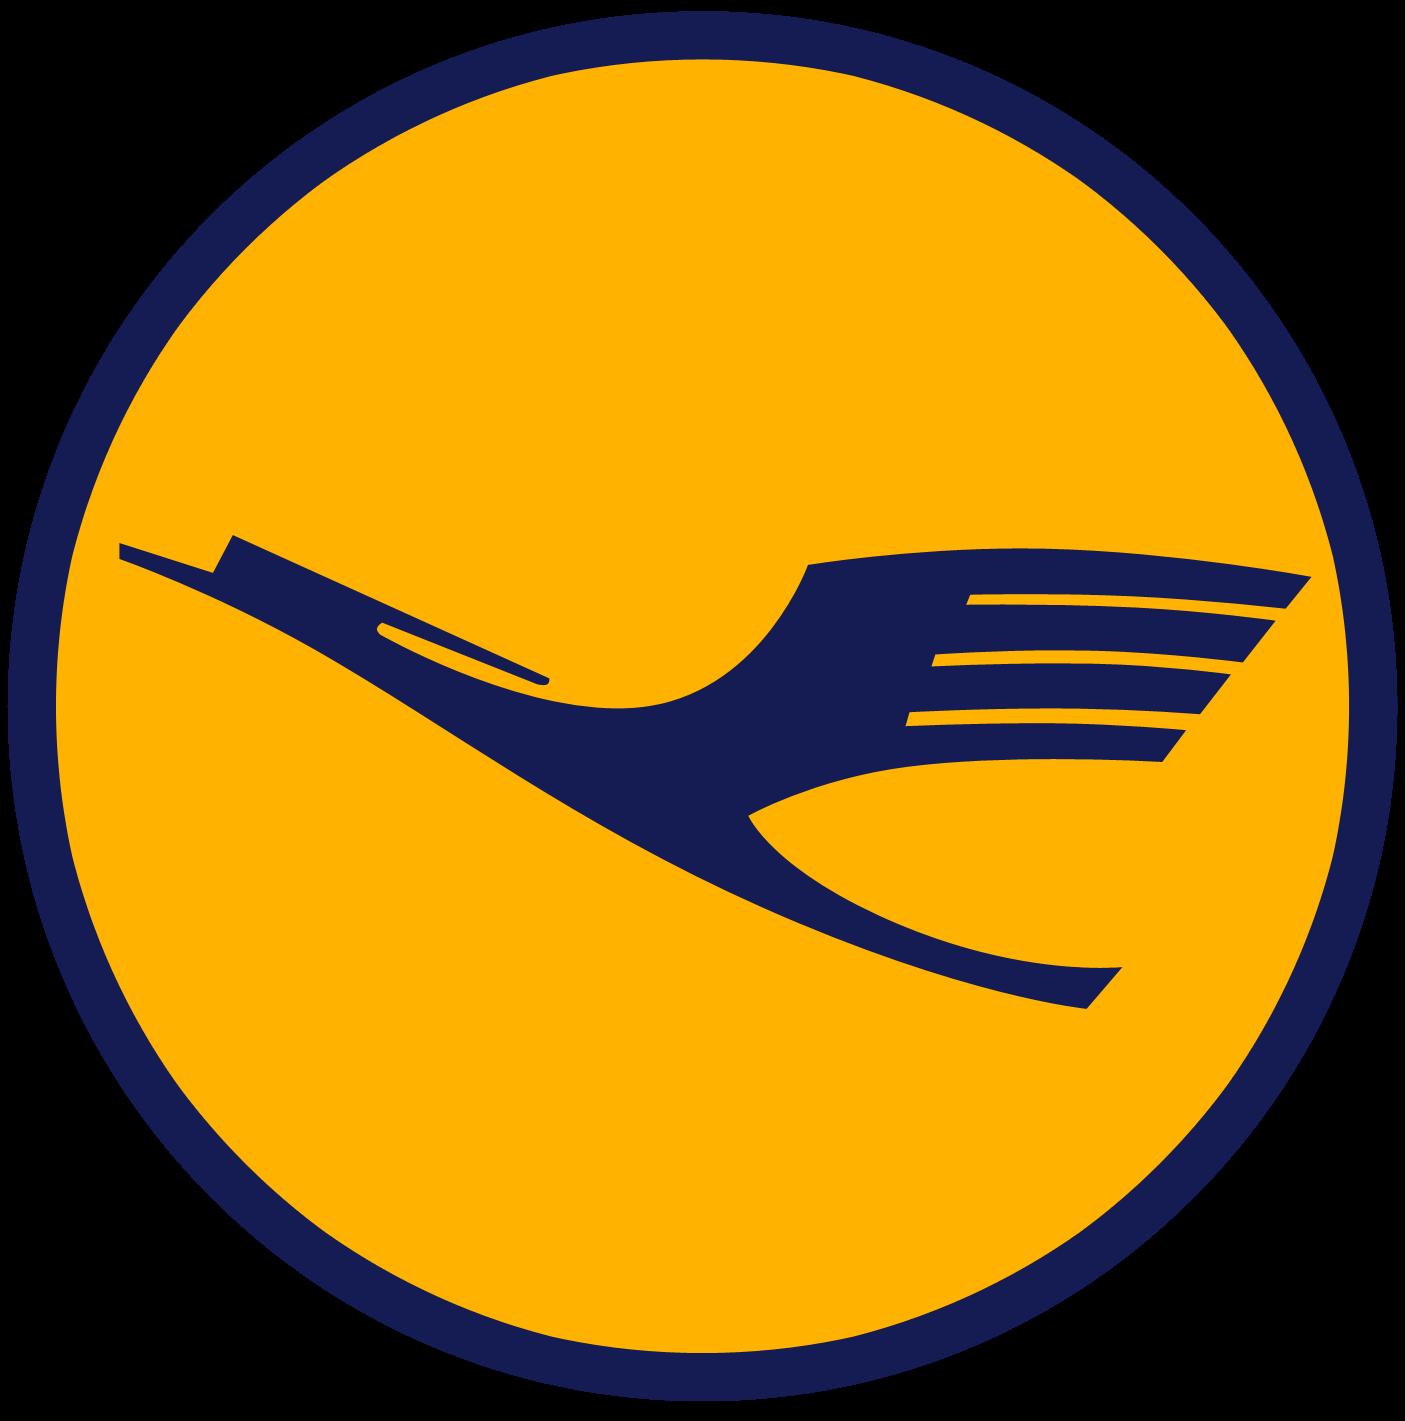 History of All Logos: All Lufthansa Logos